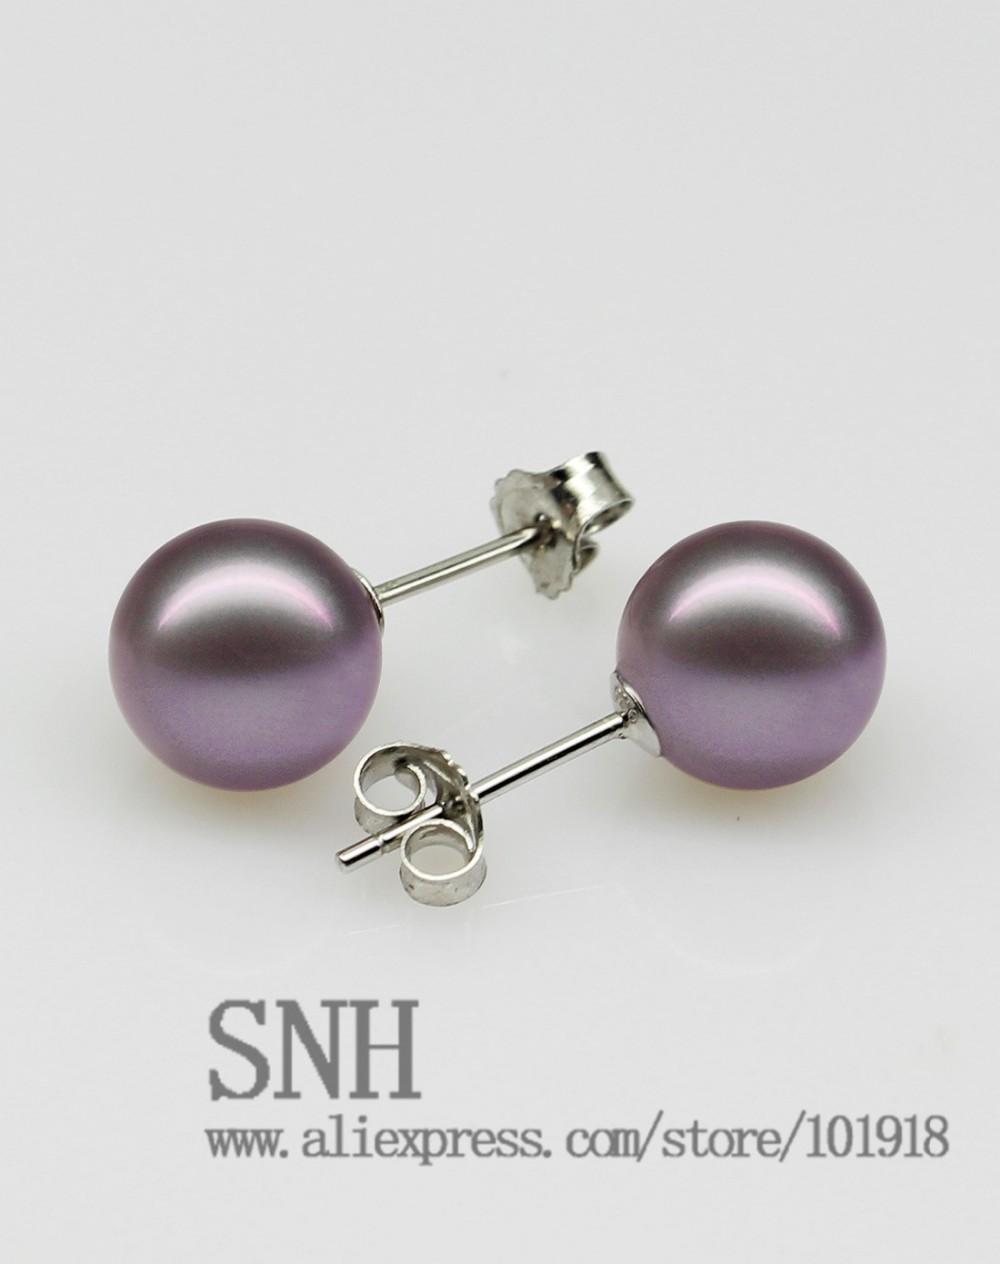 SNH-SNH2014161-3